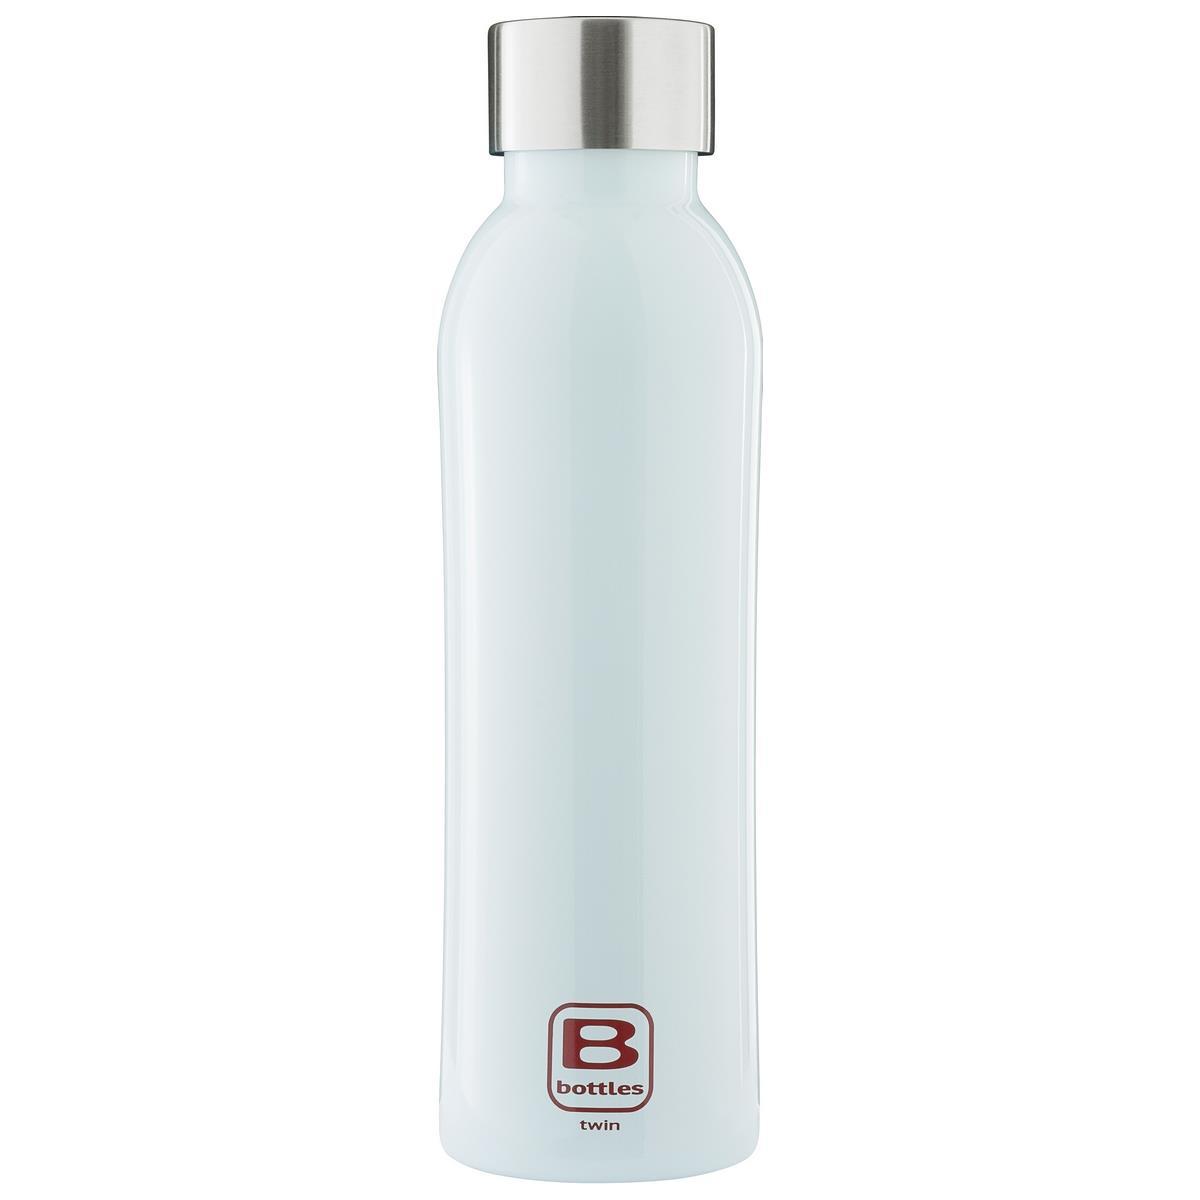 B Bottles Twin - Light Blue - 500 ml - Bottiglia Termica a doppia parete in acciaio inox 18/10